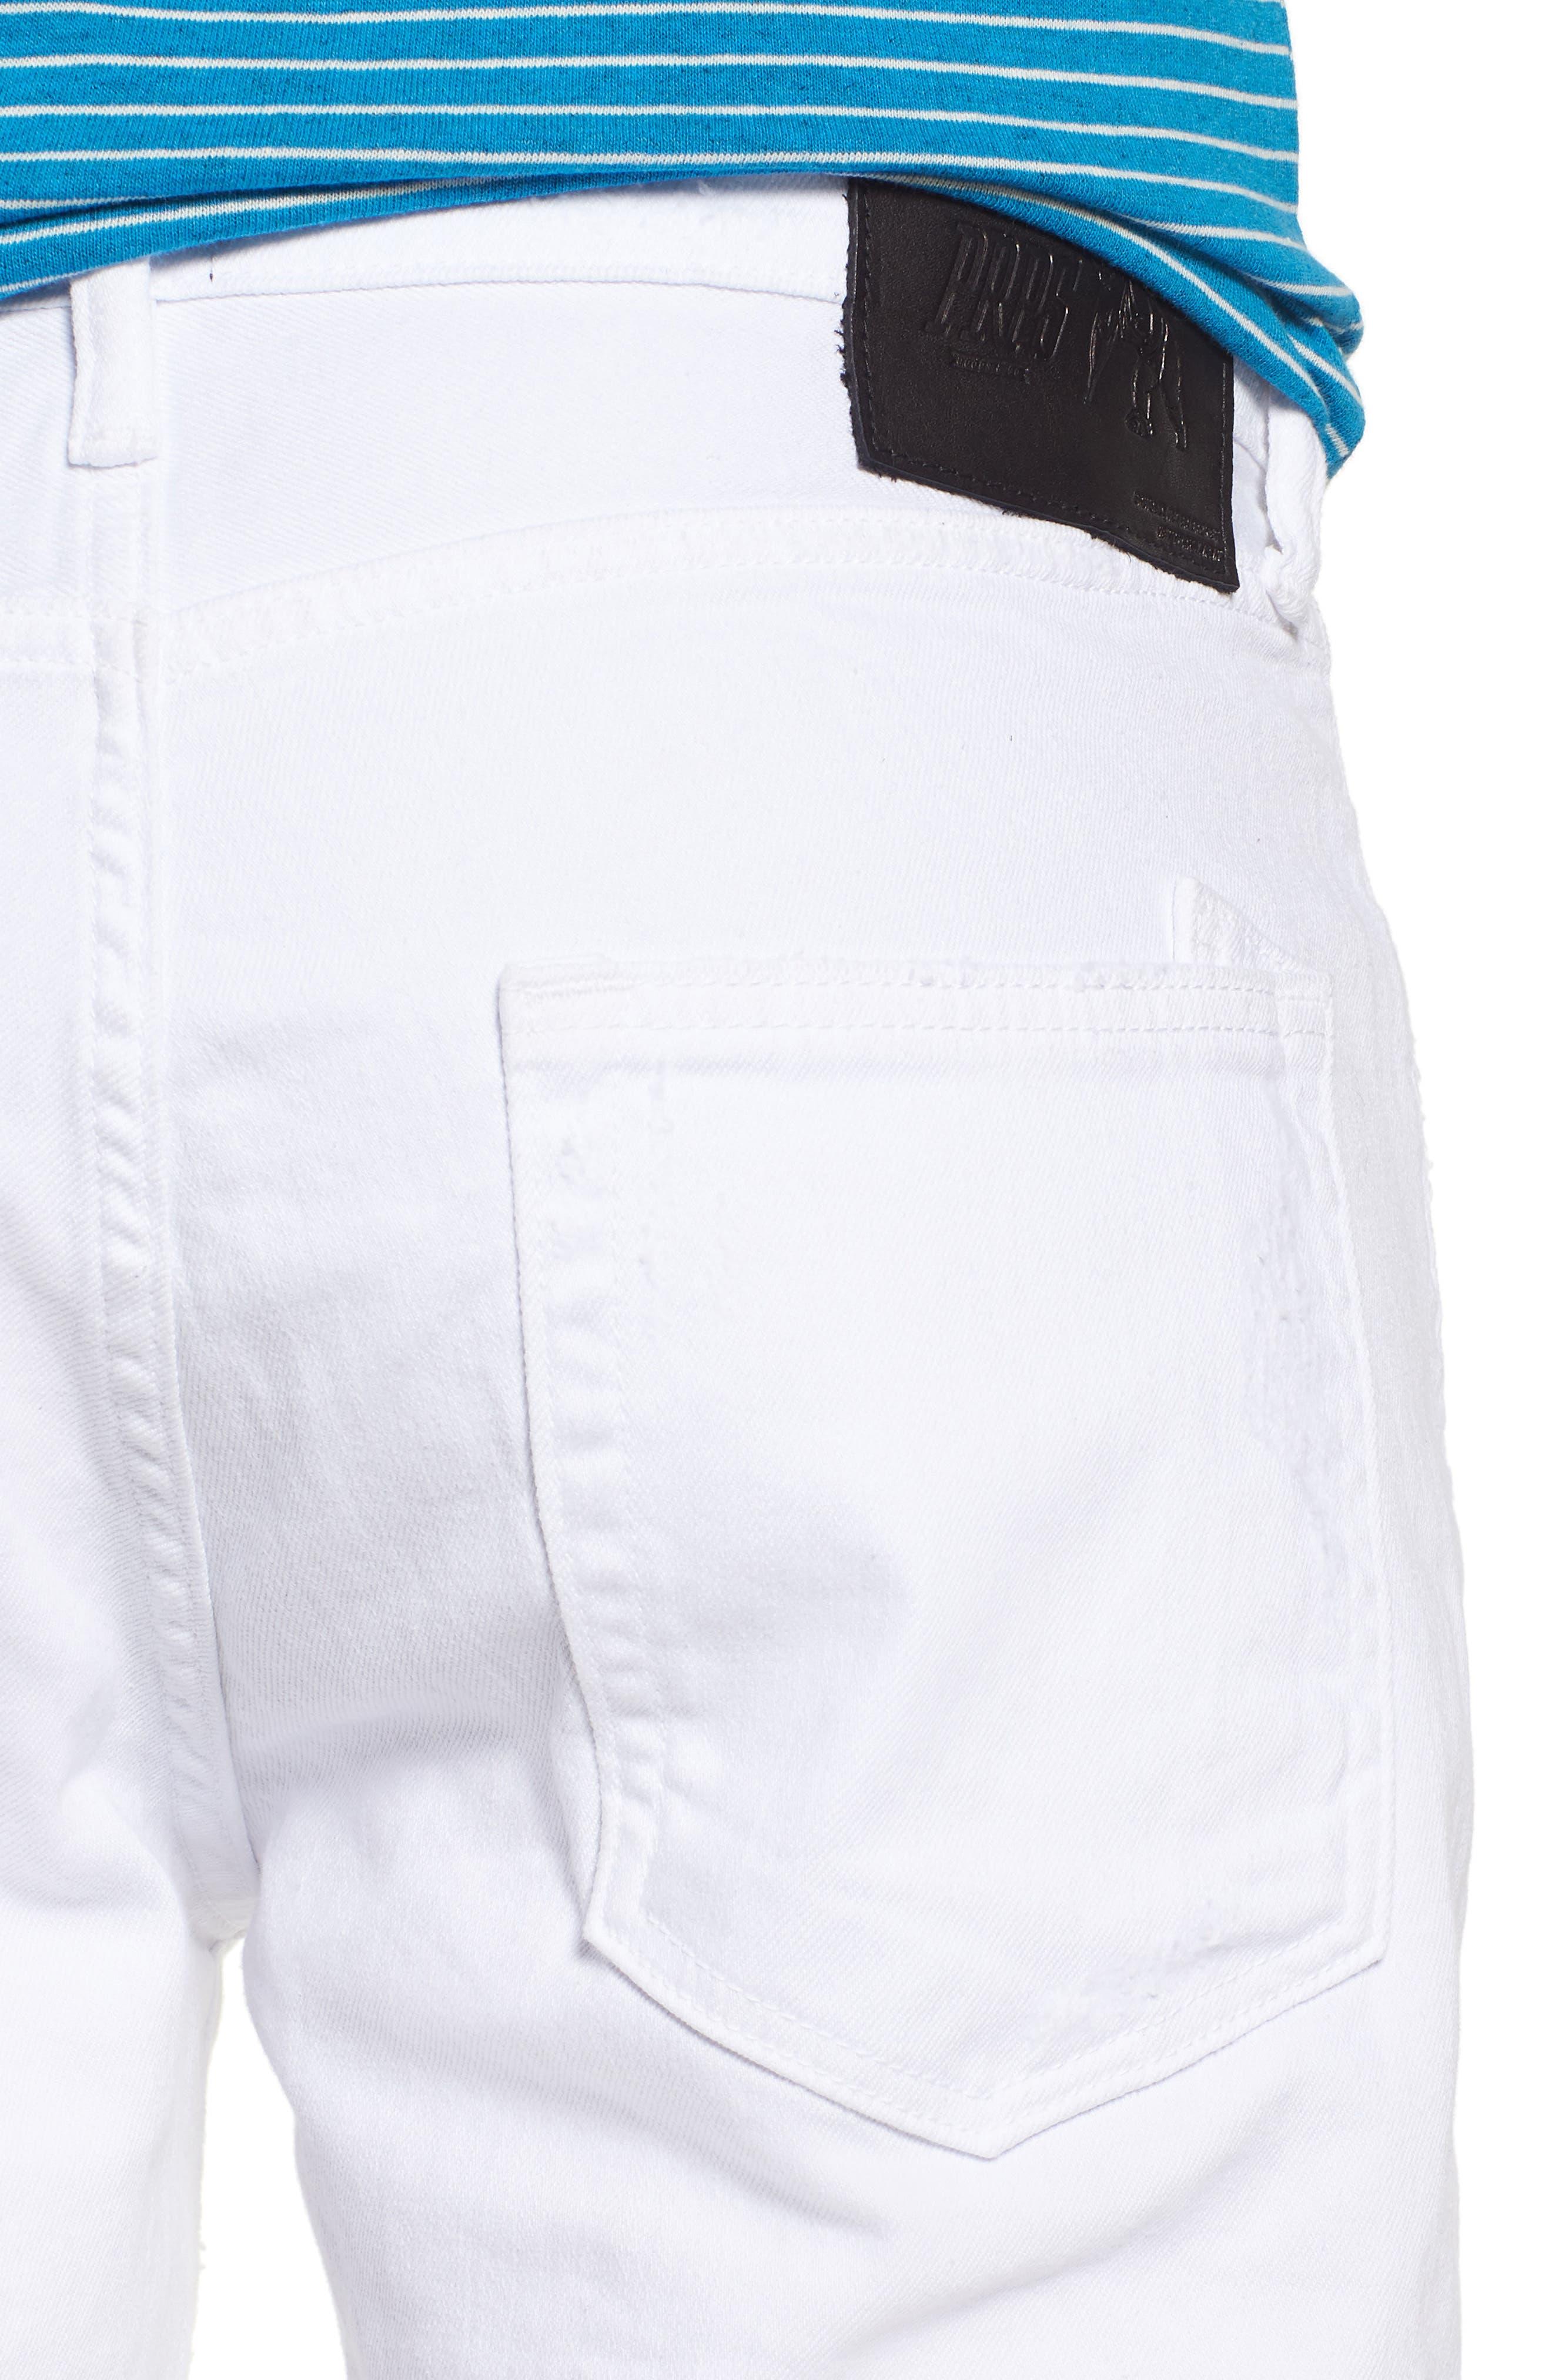 Windsor Slim Fit Jeans,                             Alternate thumbnail 4, color,                             Living White